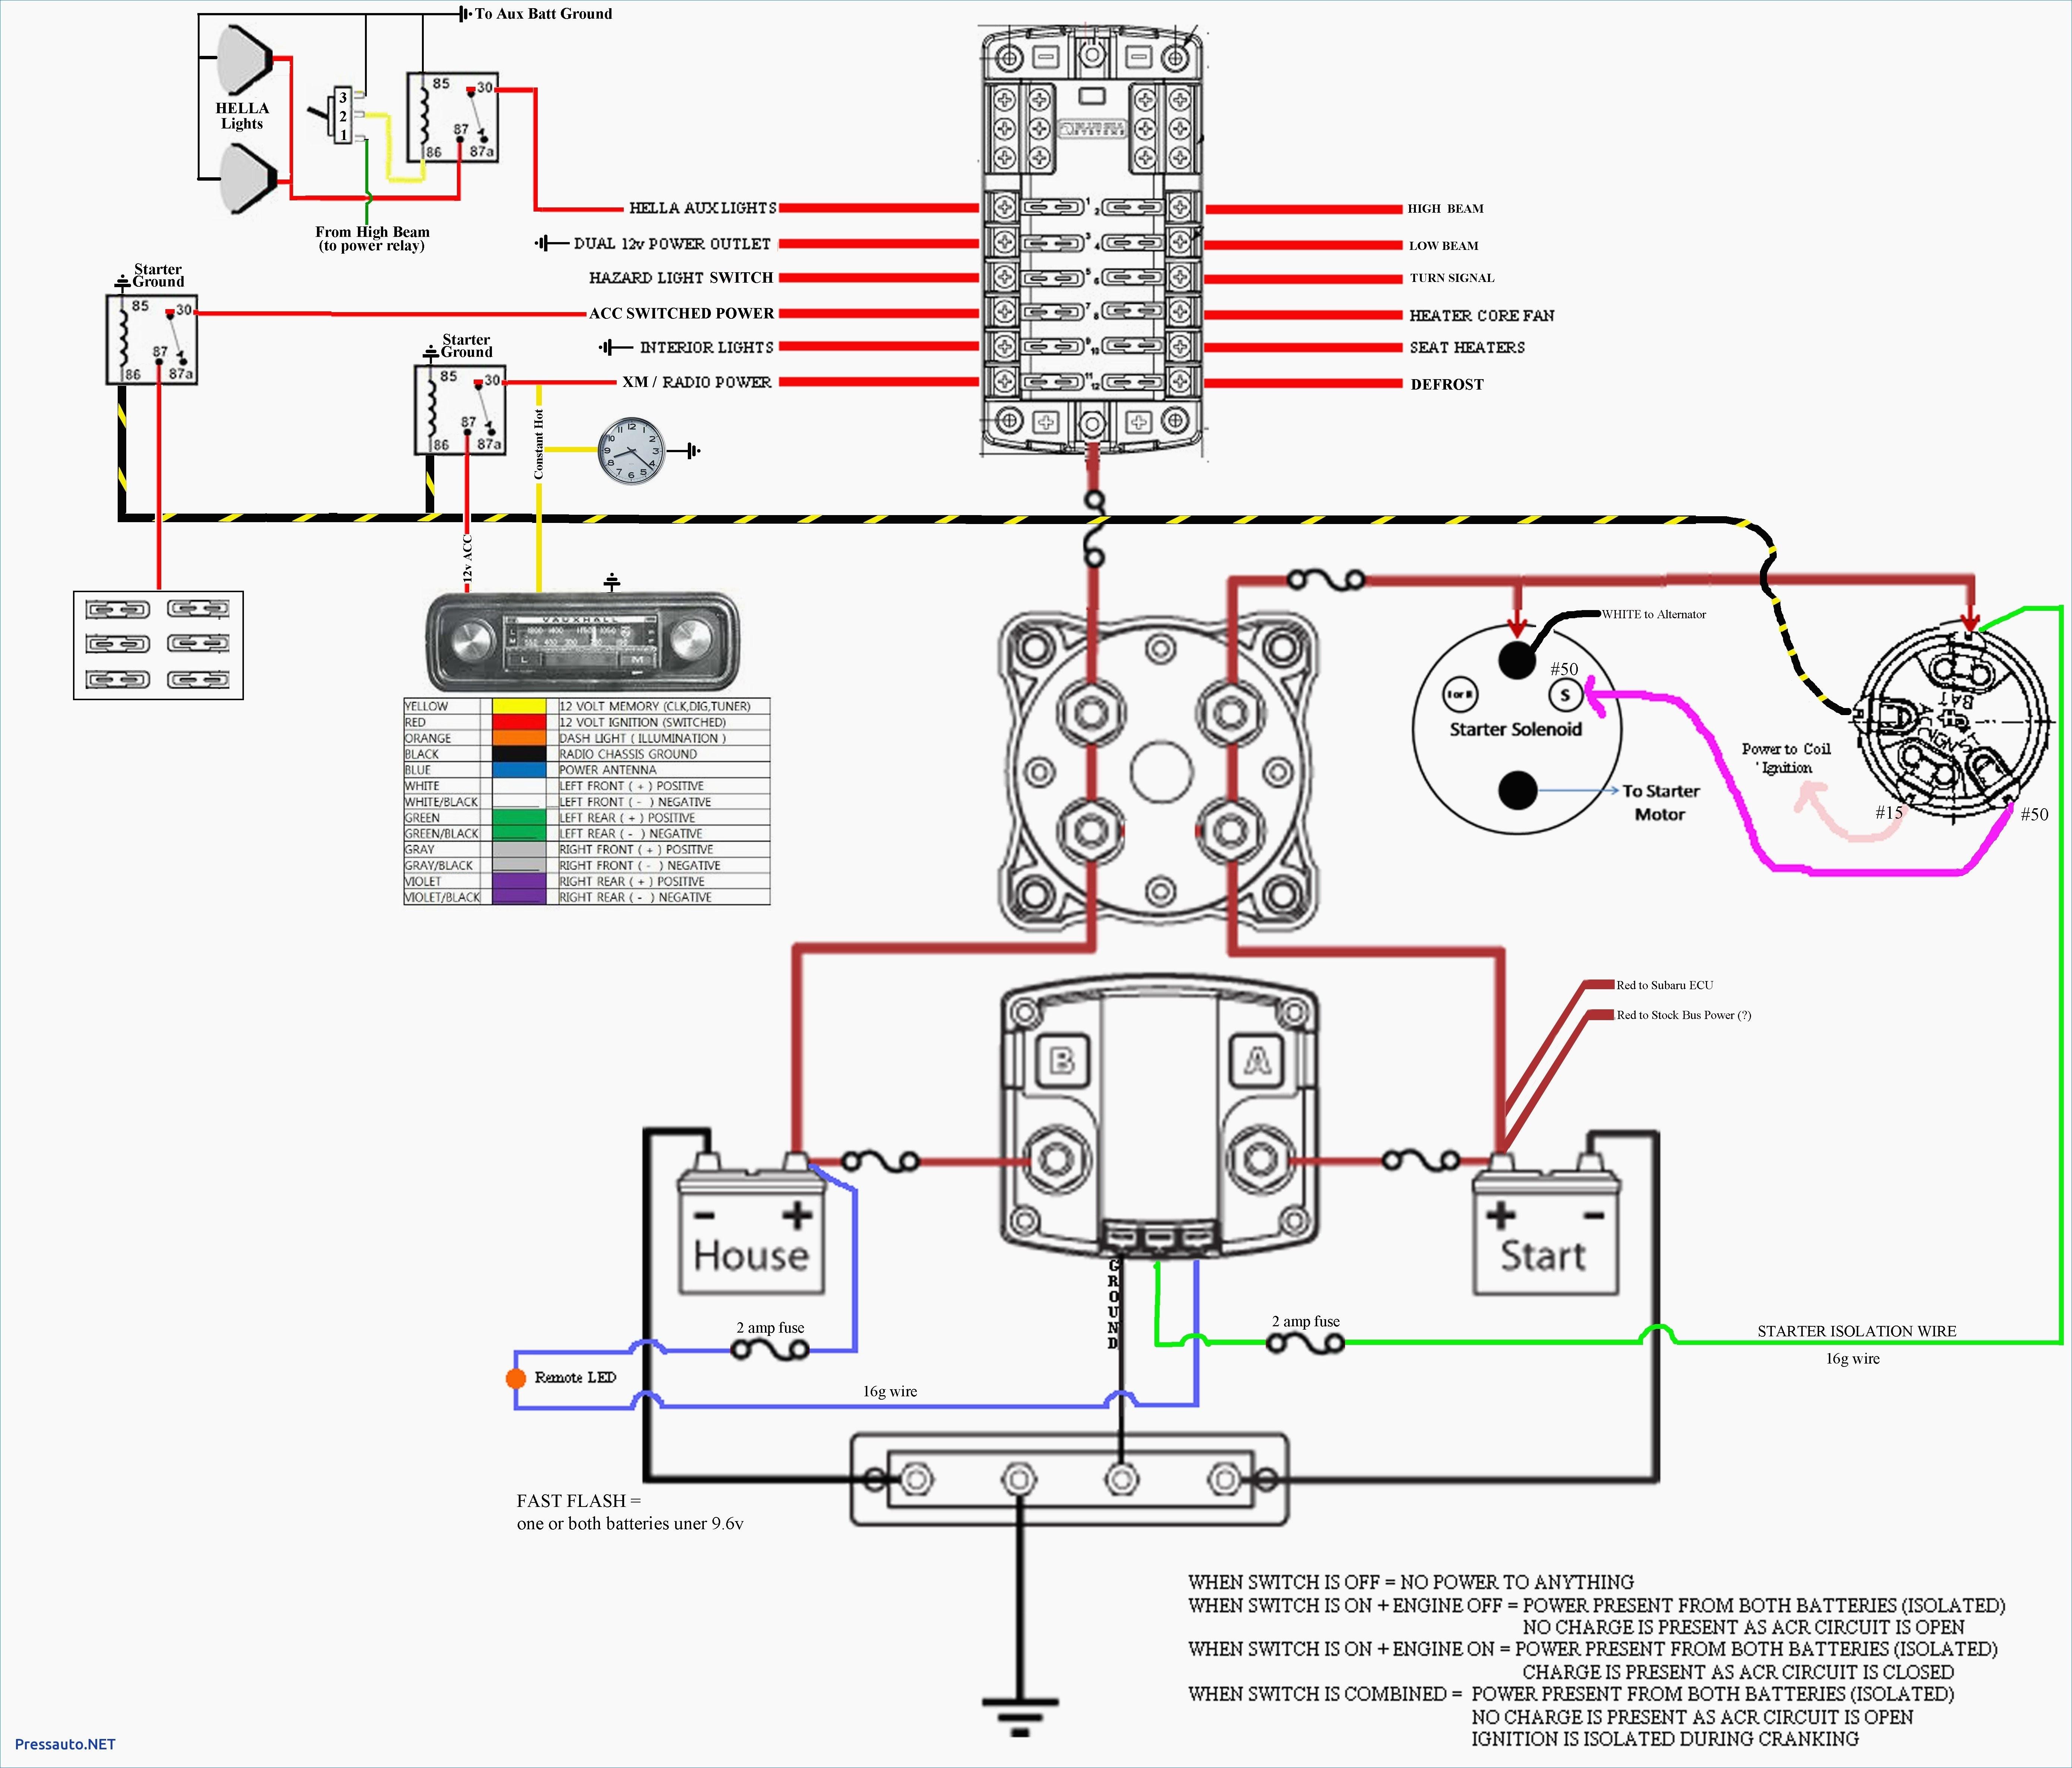 12V Battery Isolator Wiring Diagram Sure Power Battery Isolator - Sure Power Battery Isolator Wiring Diagram